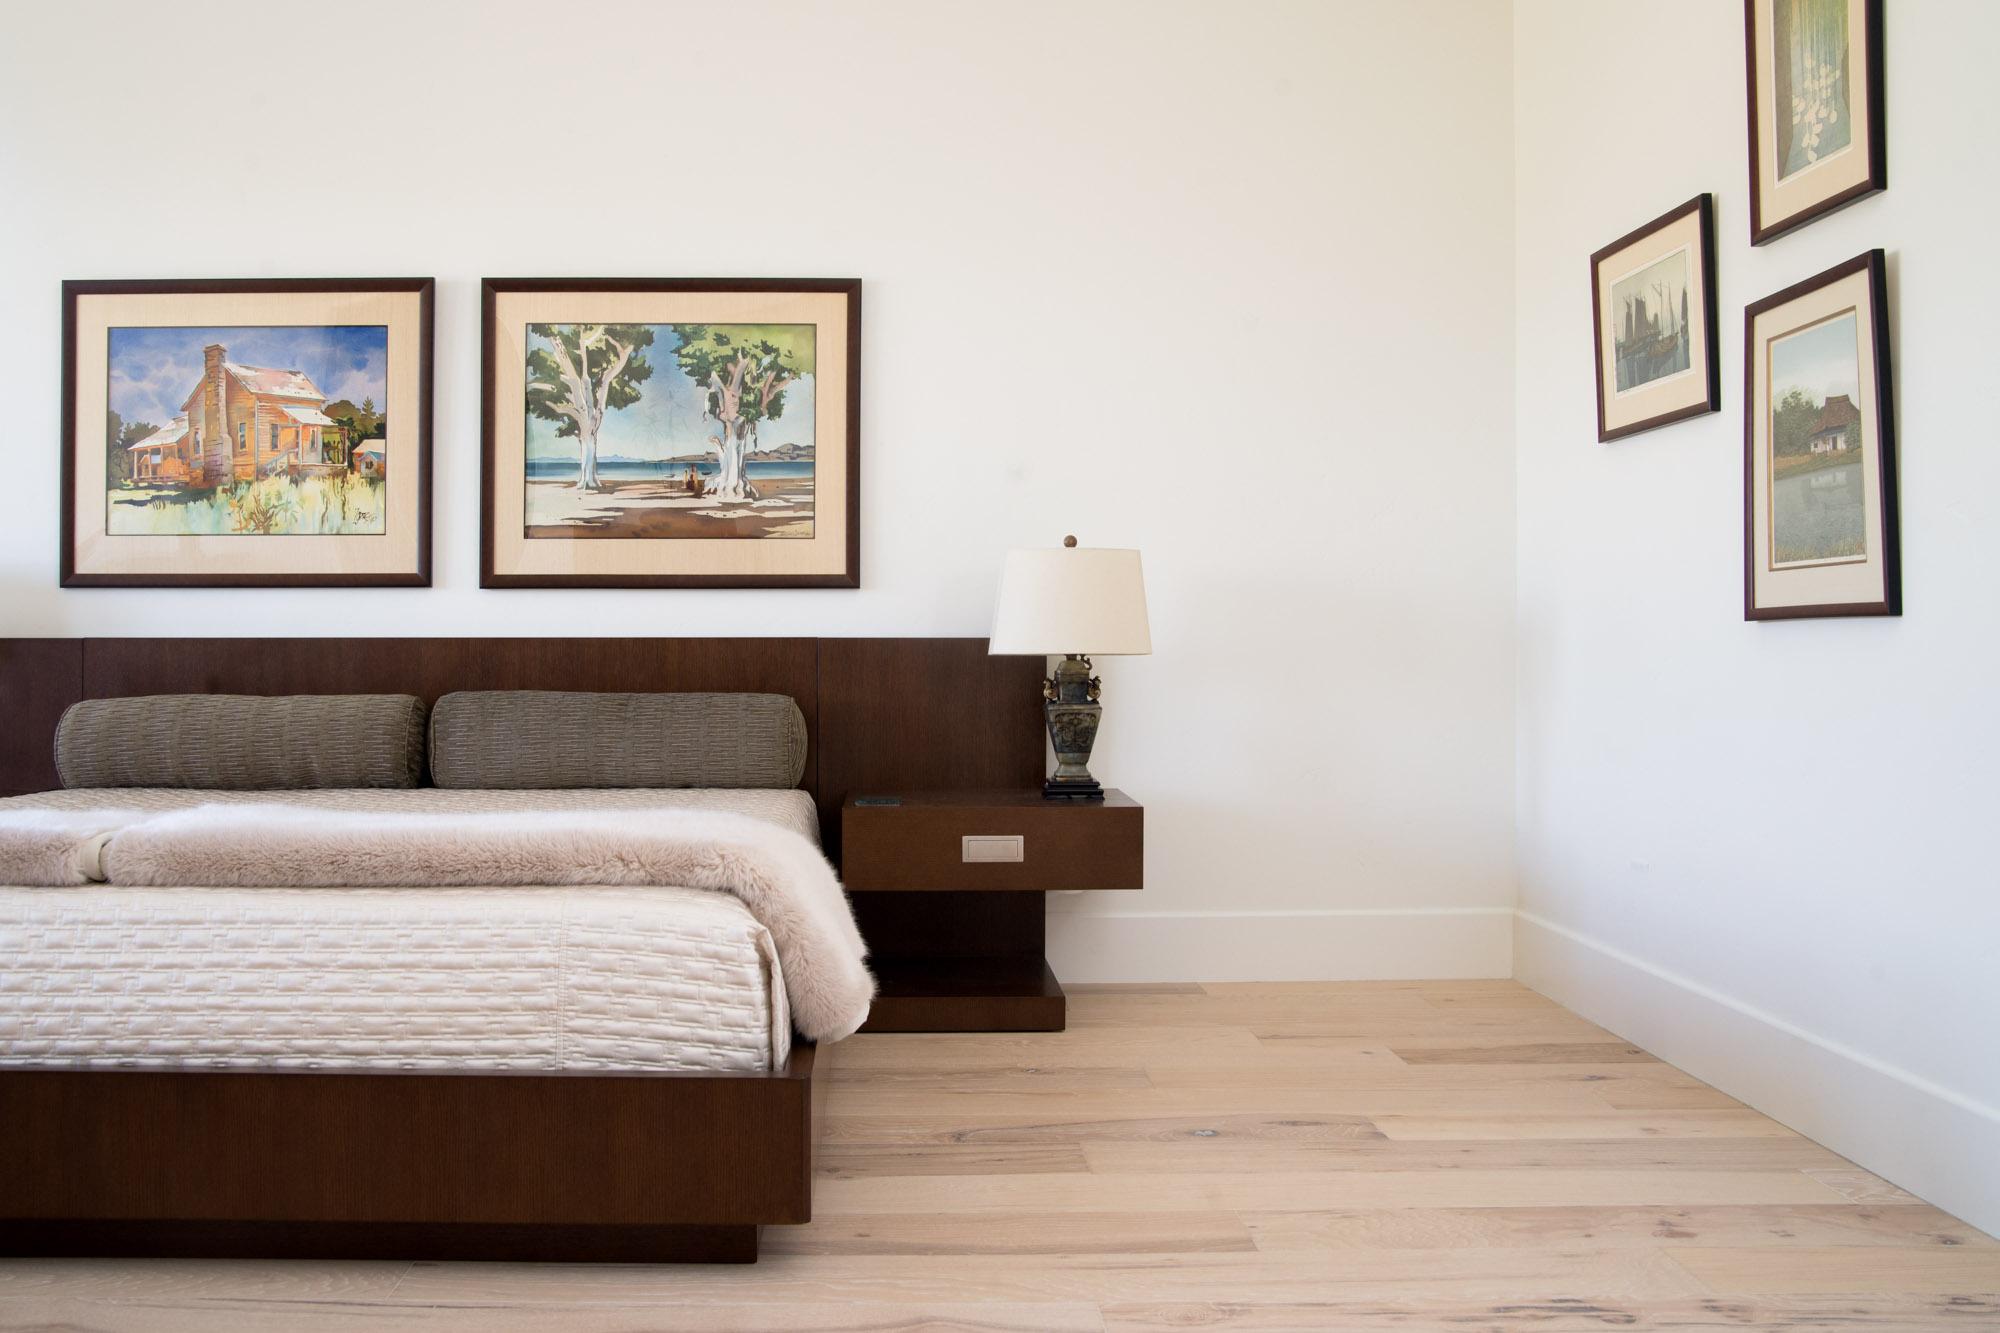 Mount Rose Estates bedroom renovation and entry design - Reno, Nevada - Kovac Design